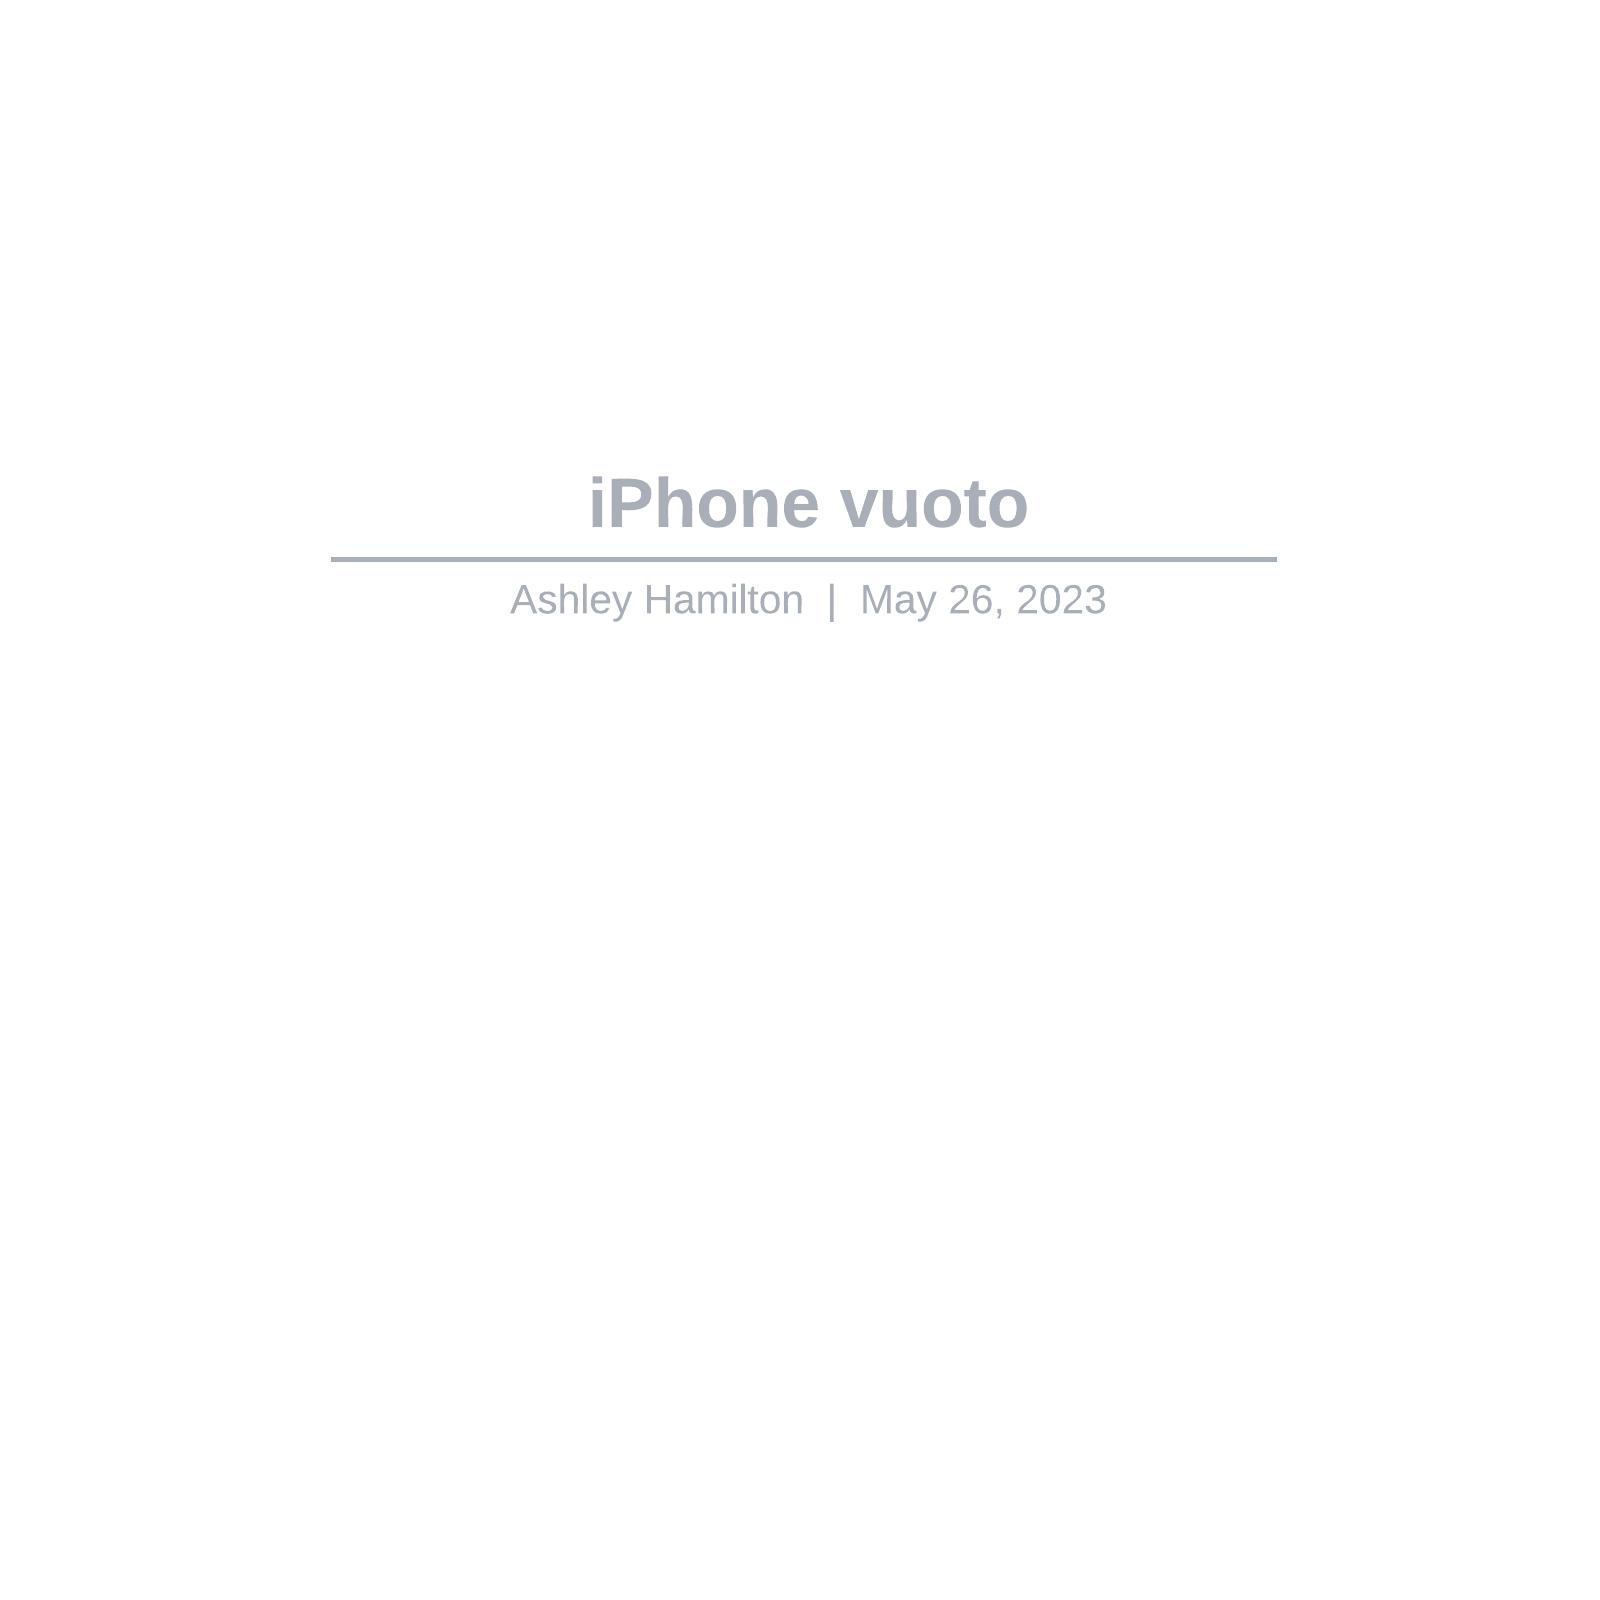 iPhone vuoto